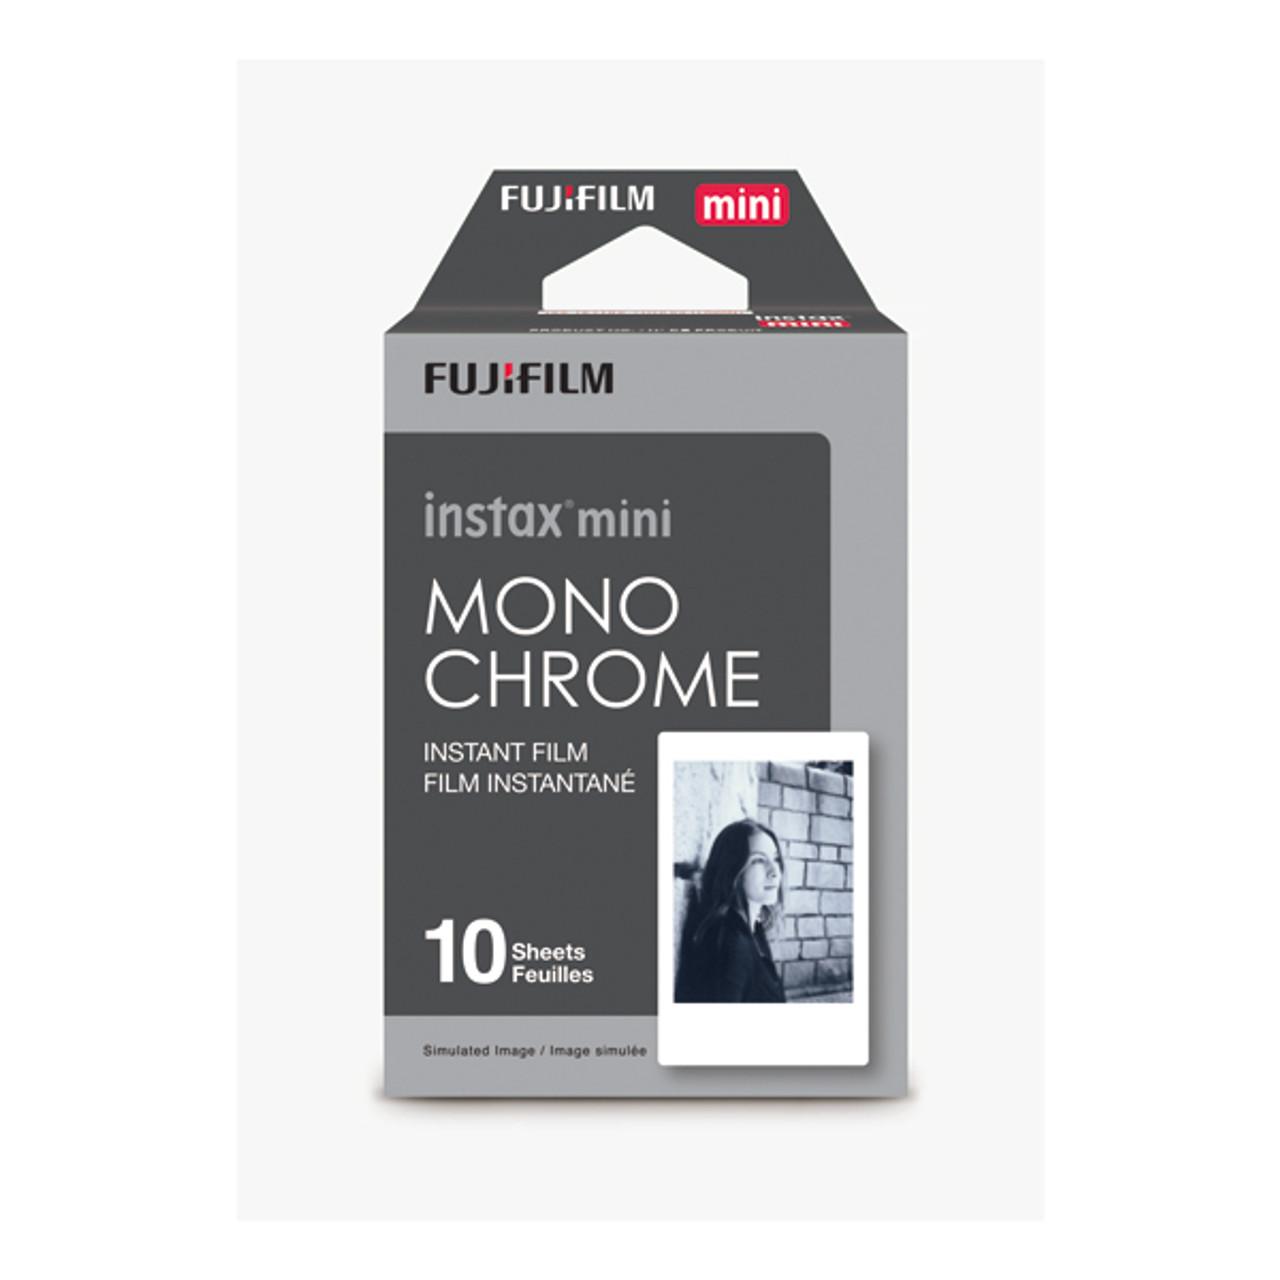 Fujifilm Instax Mini Monochrome Instant Film